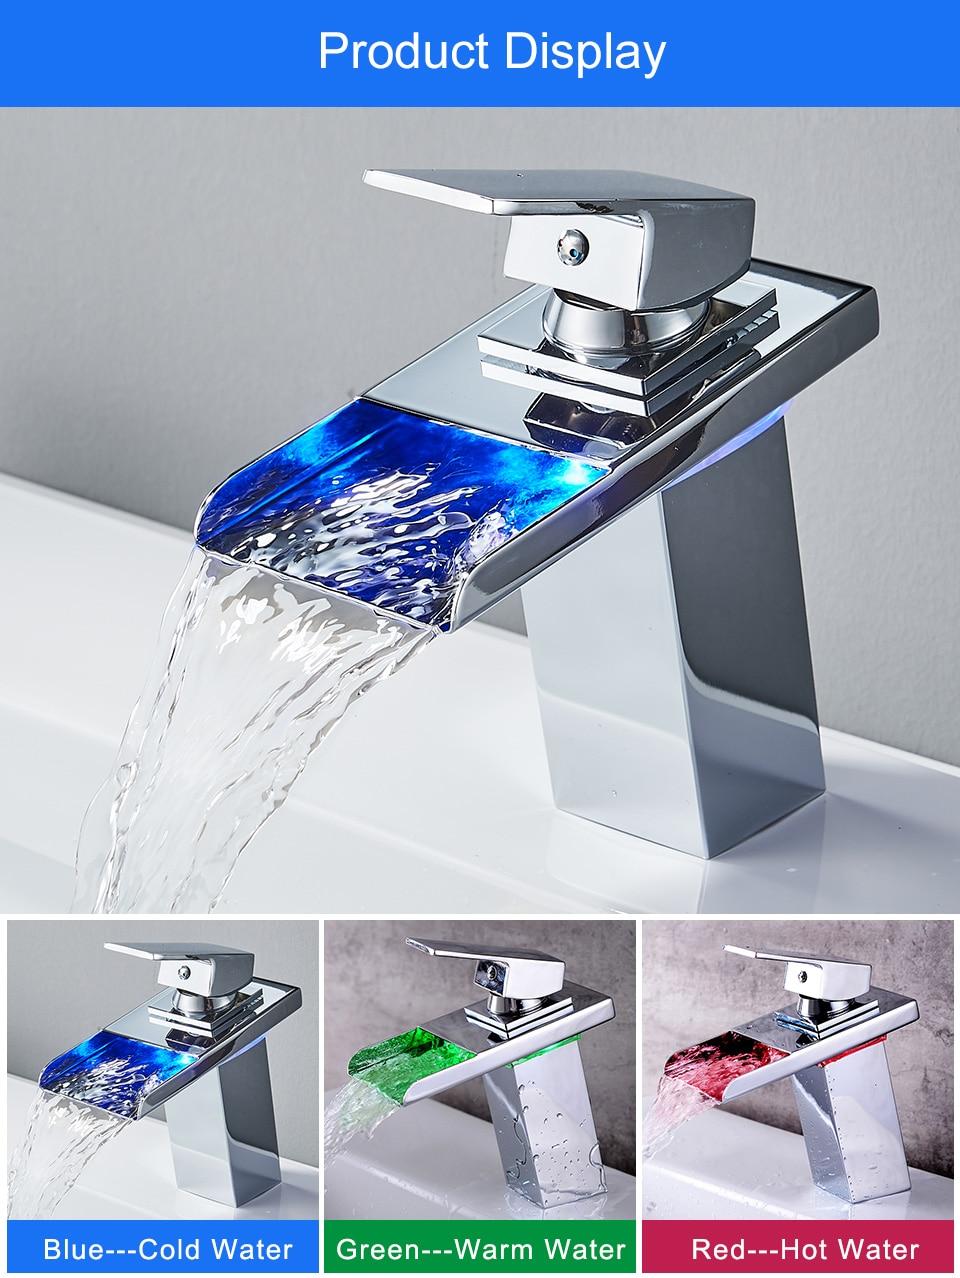 Hae200fa71590428ca35fd7a60b8dba25B ROVADE Bathroom LED Basin Faucet, Waterfall Bathroom Sink Tap Cold and Hot Mixer Crane (Chrome)